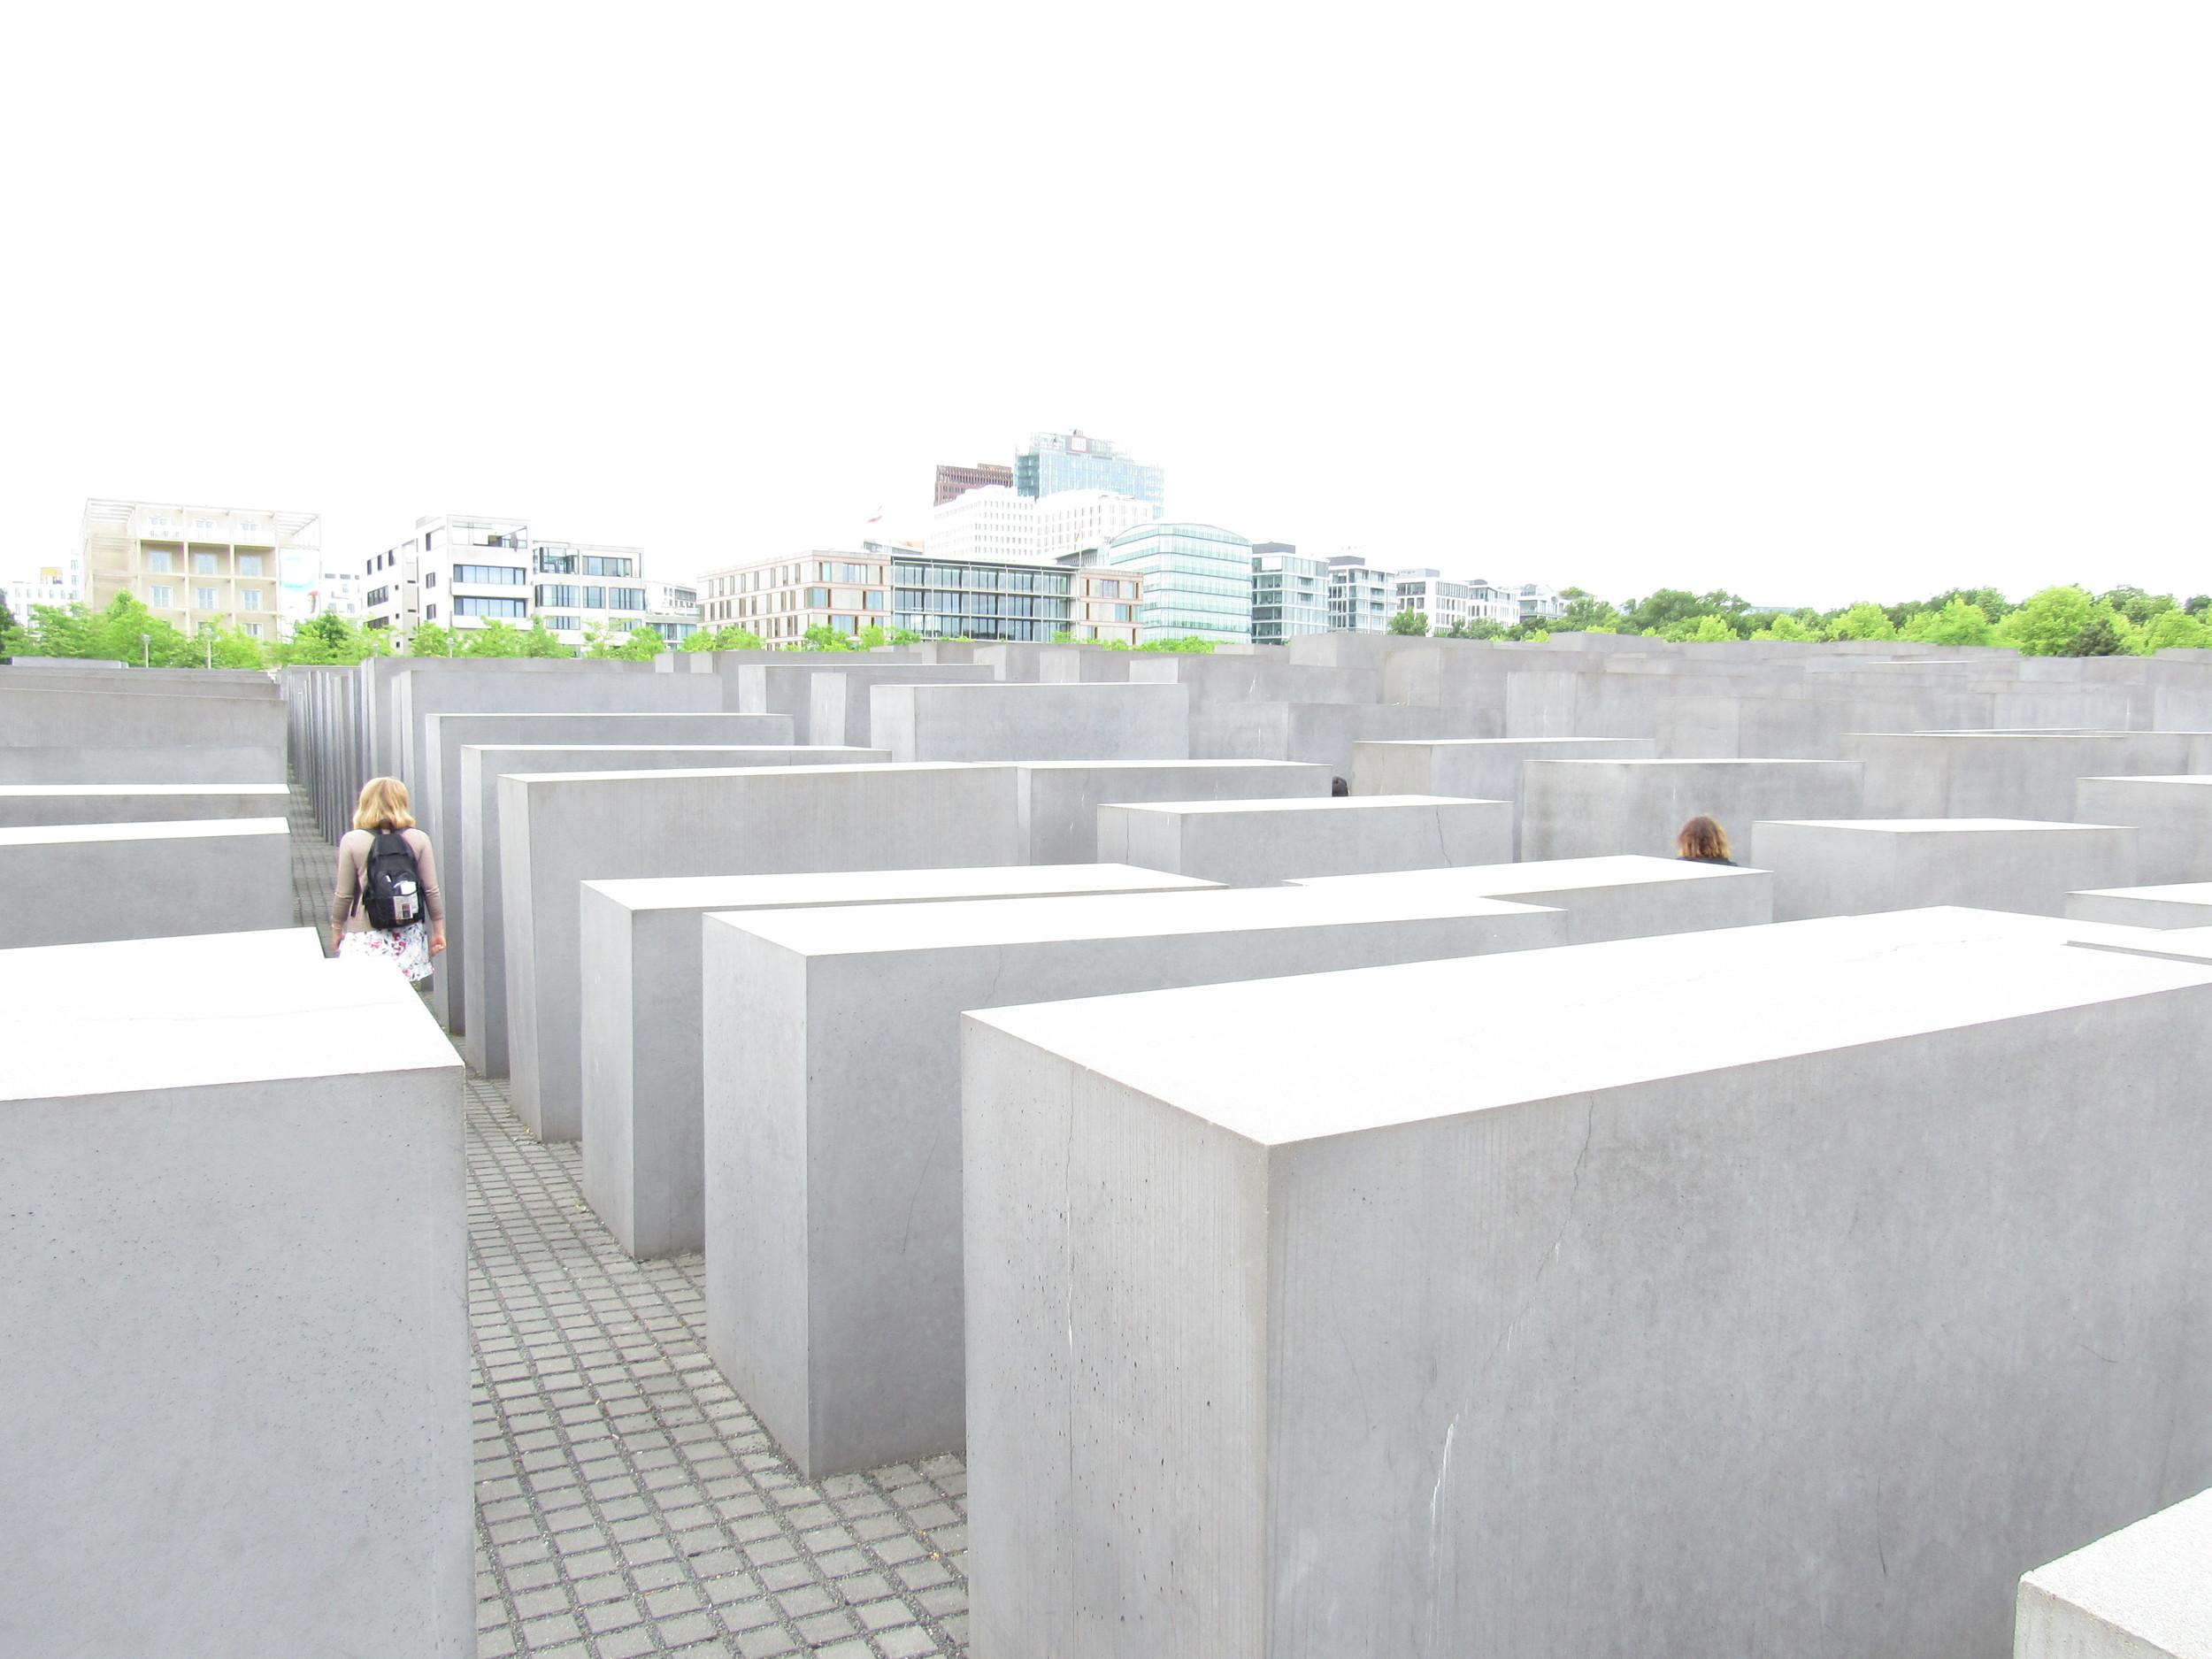 The Holocaust Memorial was beautiful.